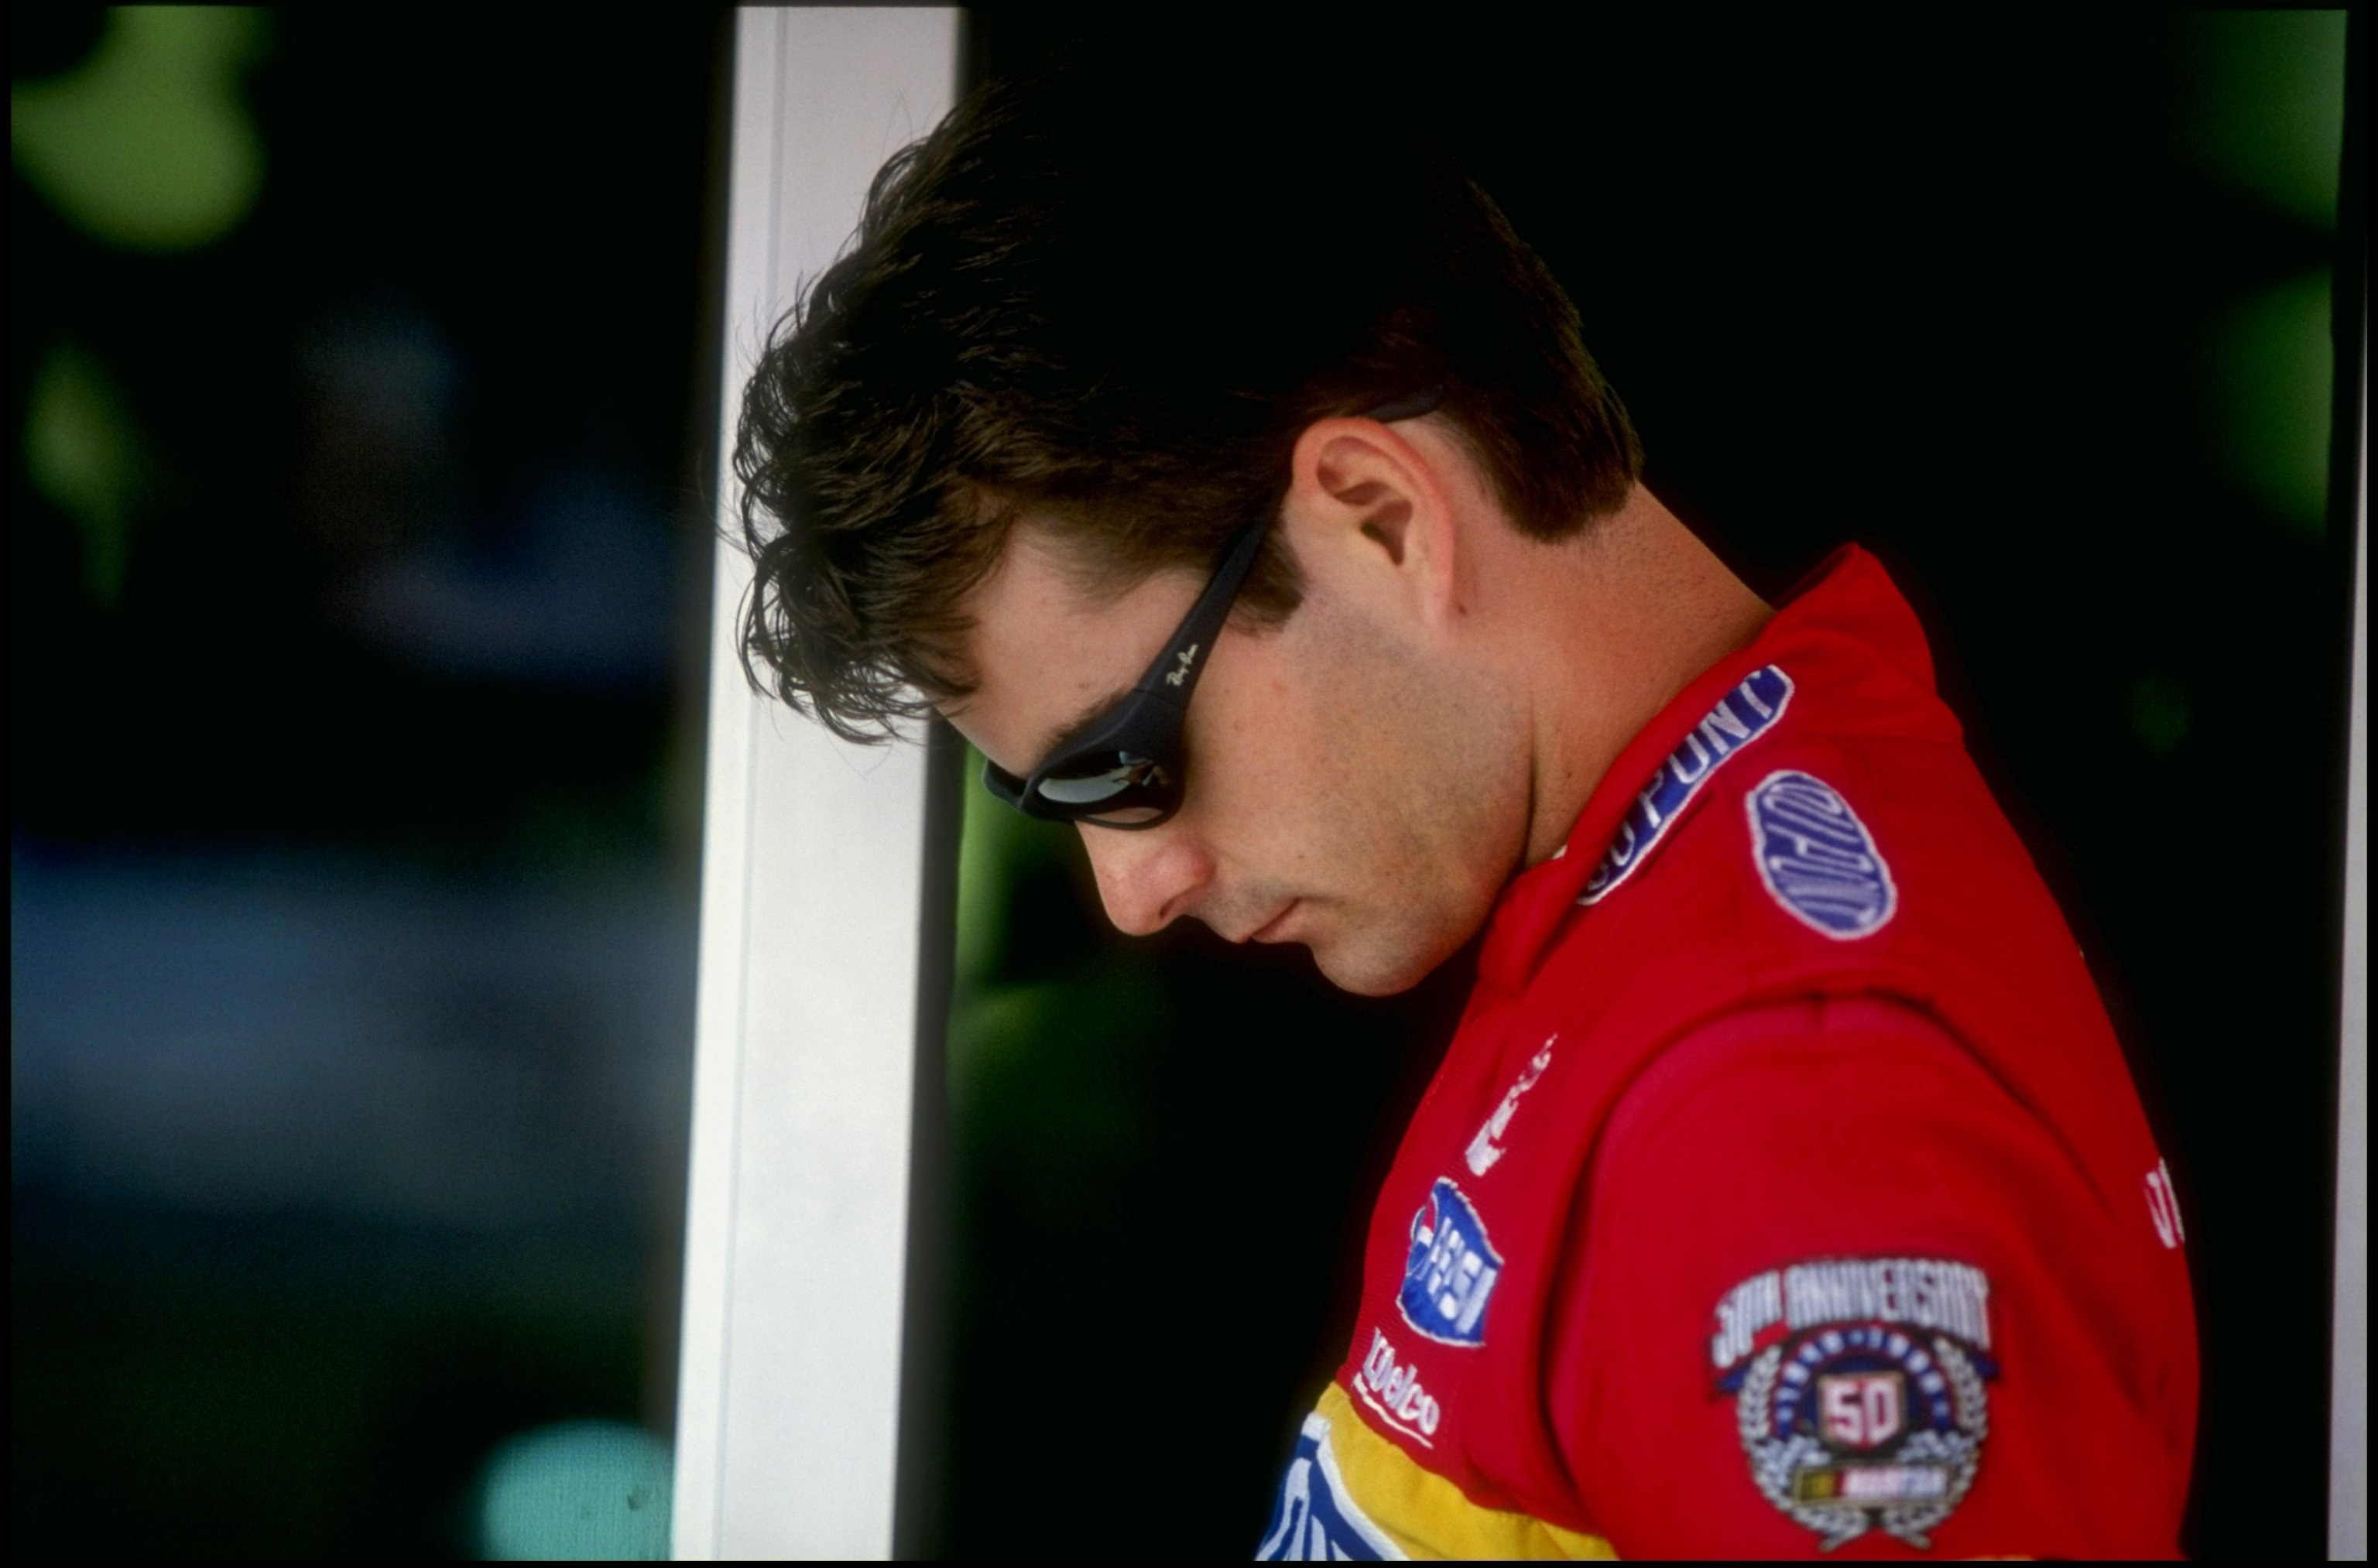 """Tiregate"" Scandal Rocked NASCAR in '98"